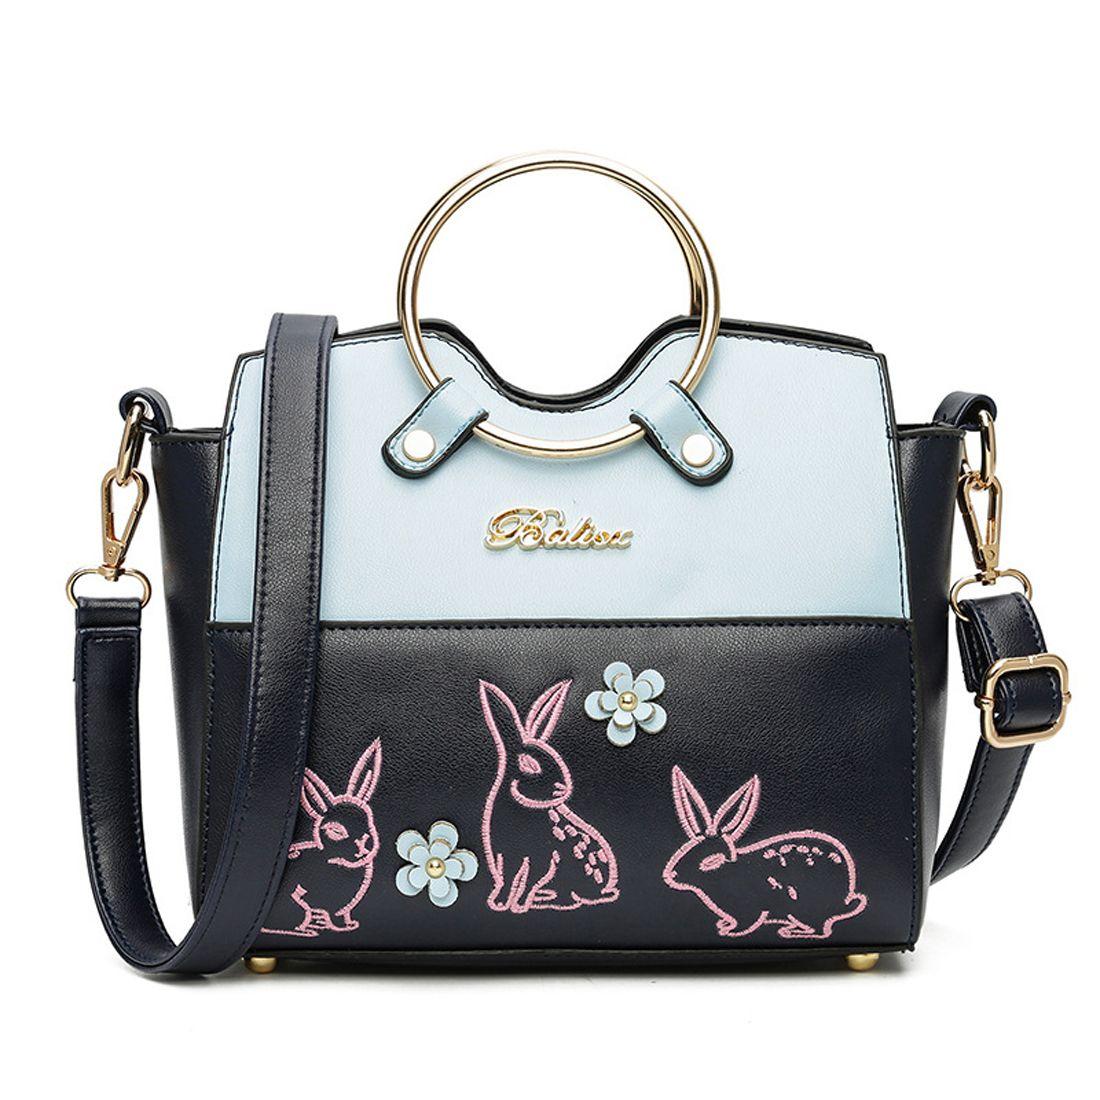 2017 Luxury Handbags Women Bags Designer Rabbit Embroidery Handbag Circle Handle Bag Shoulder Messenger Cross Body